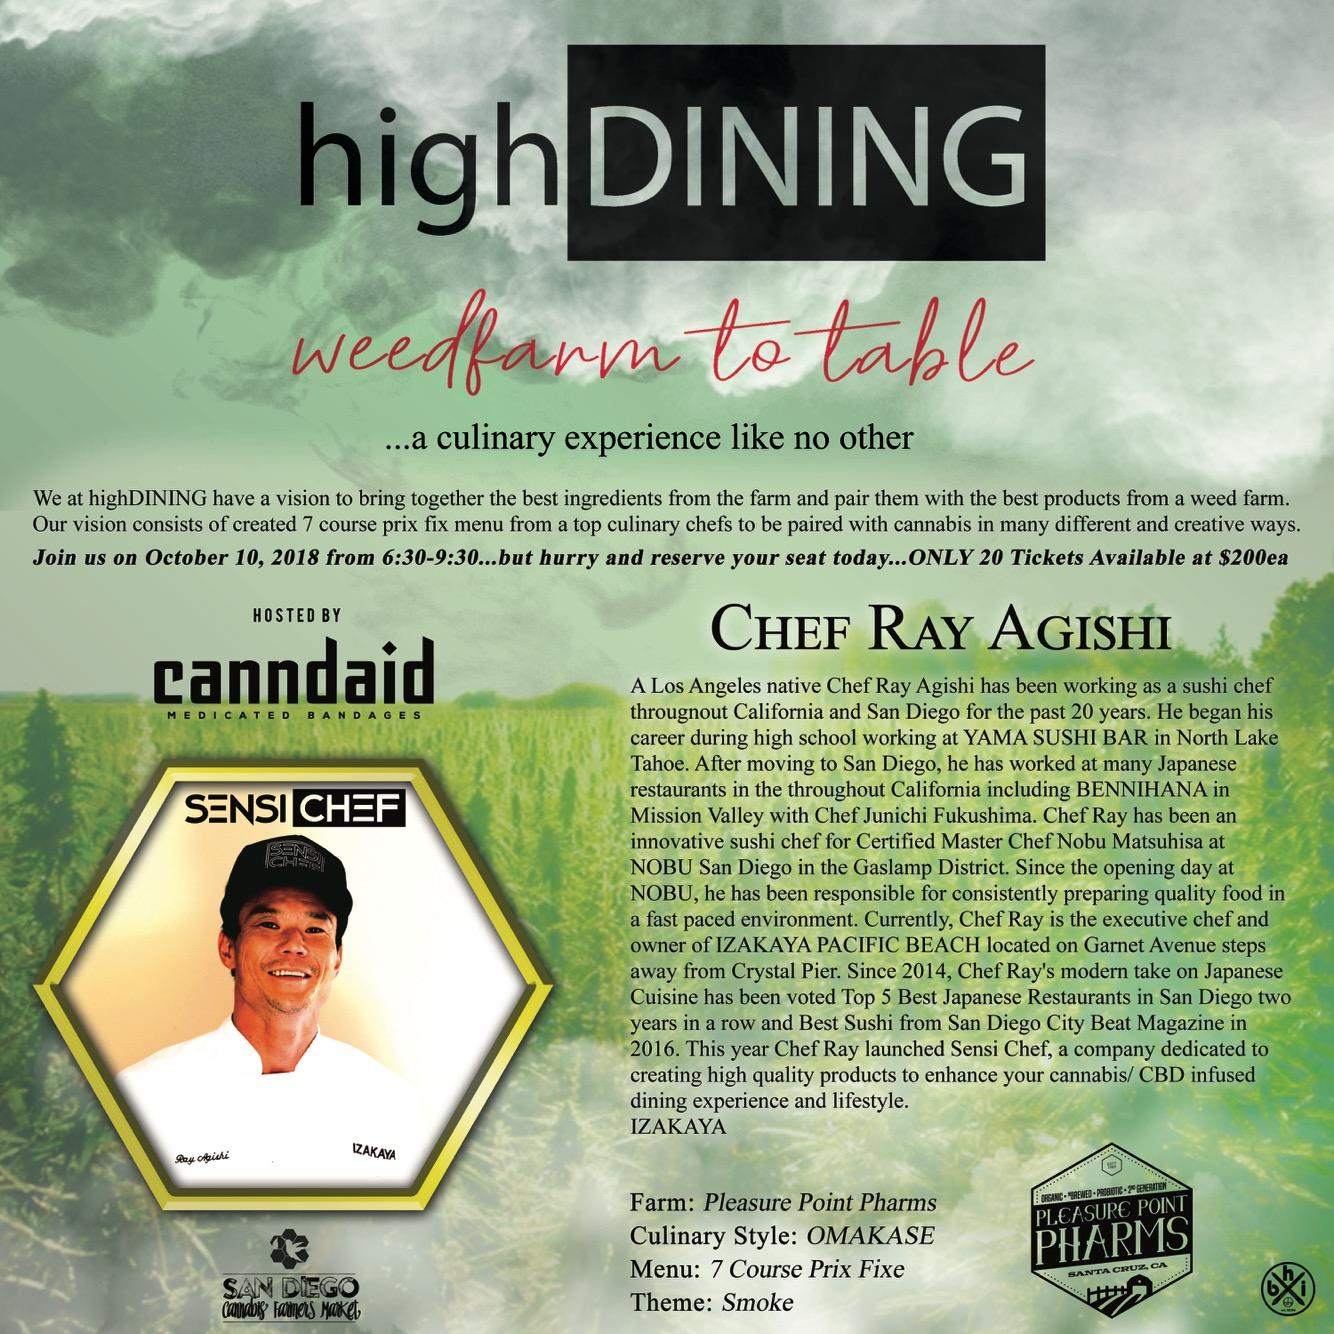 High Dining